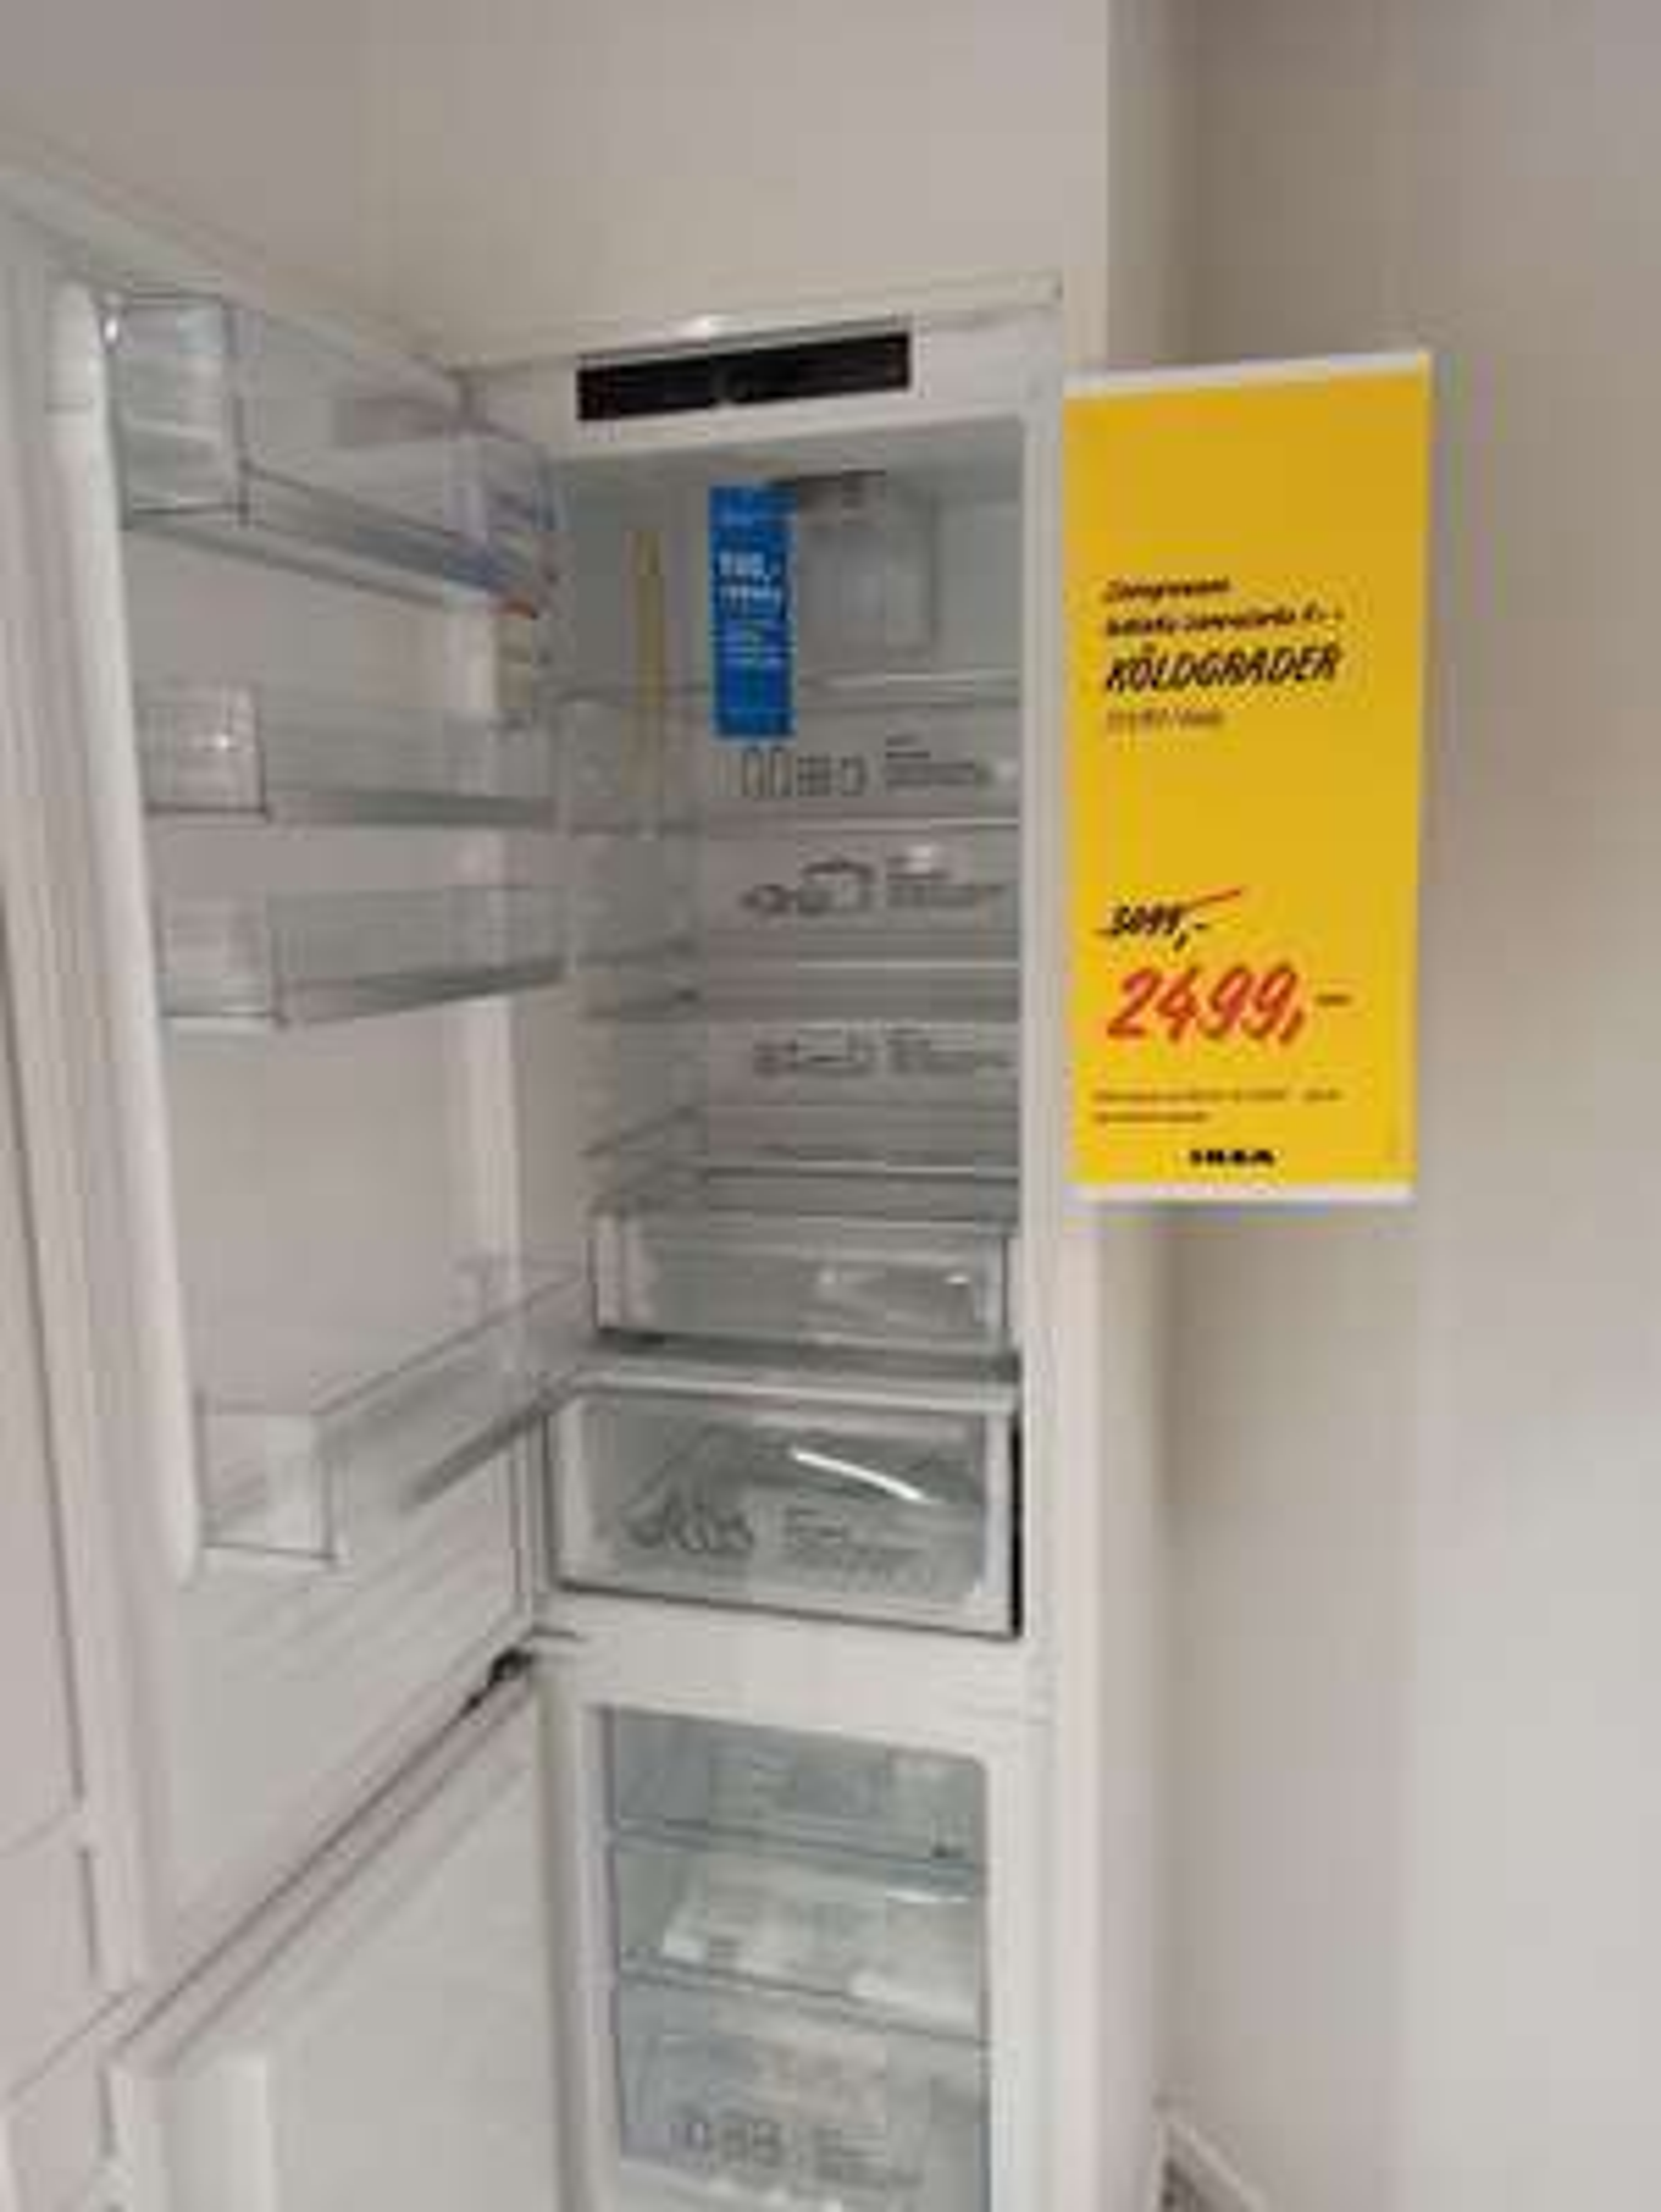 Lodówko-zamrażarka Koldgrader A++ @IKEA Gdańsk